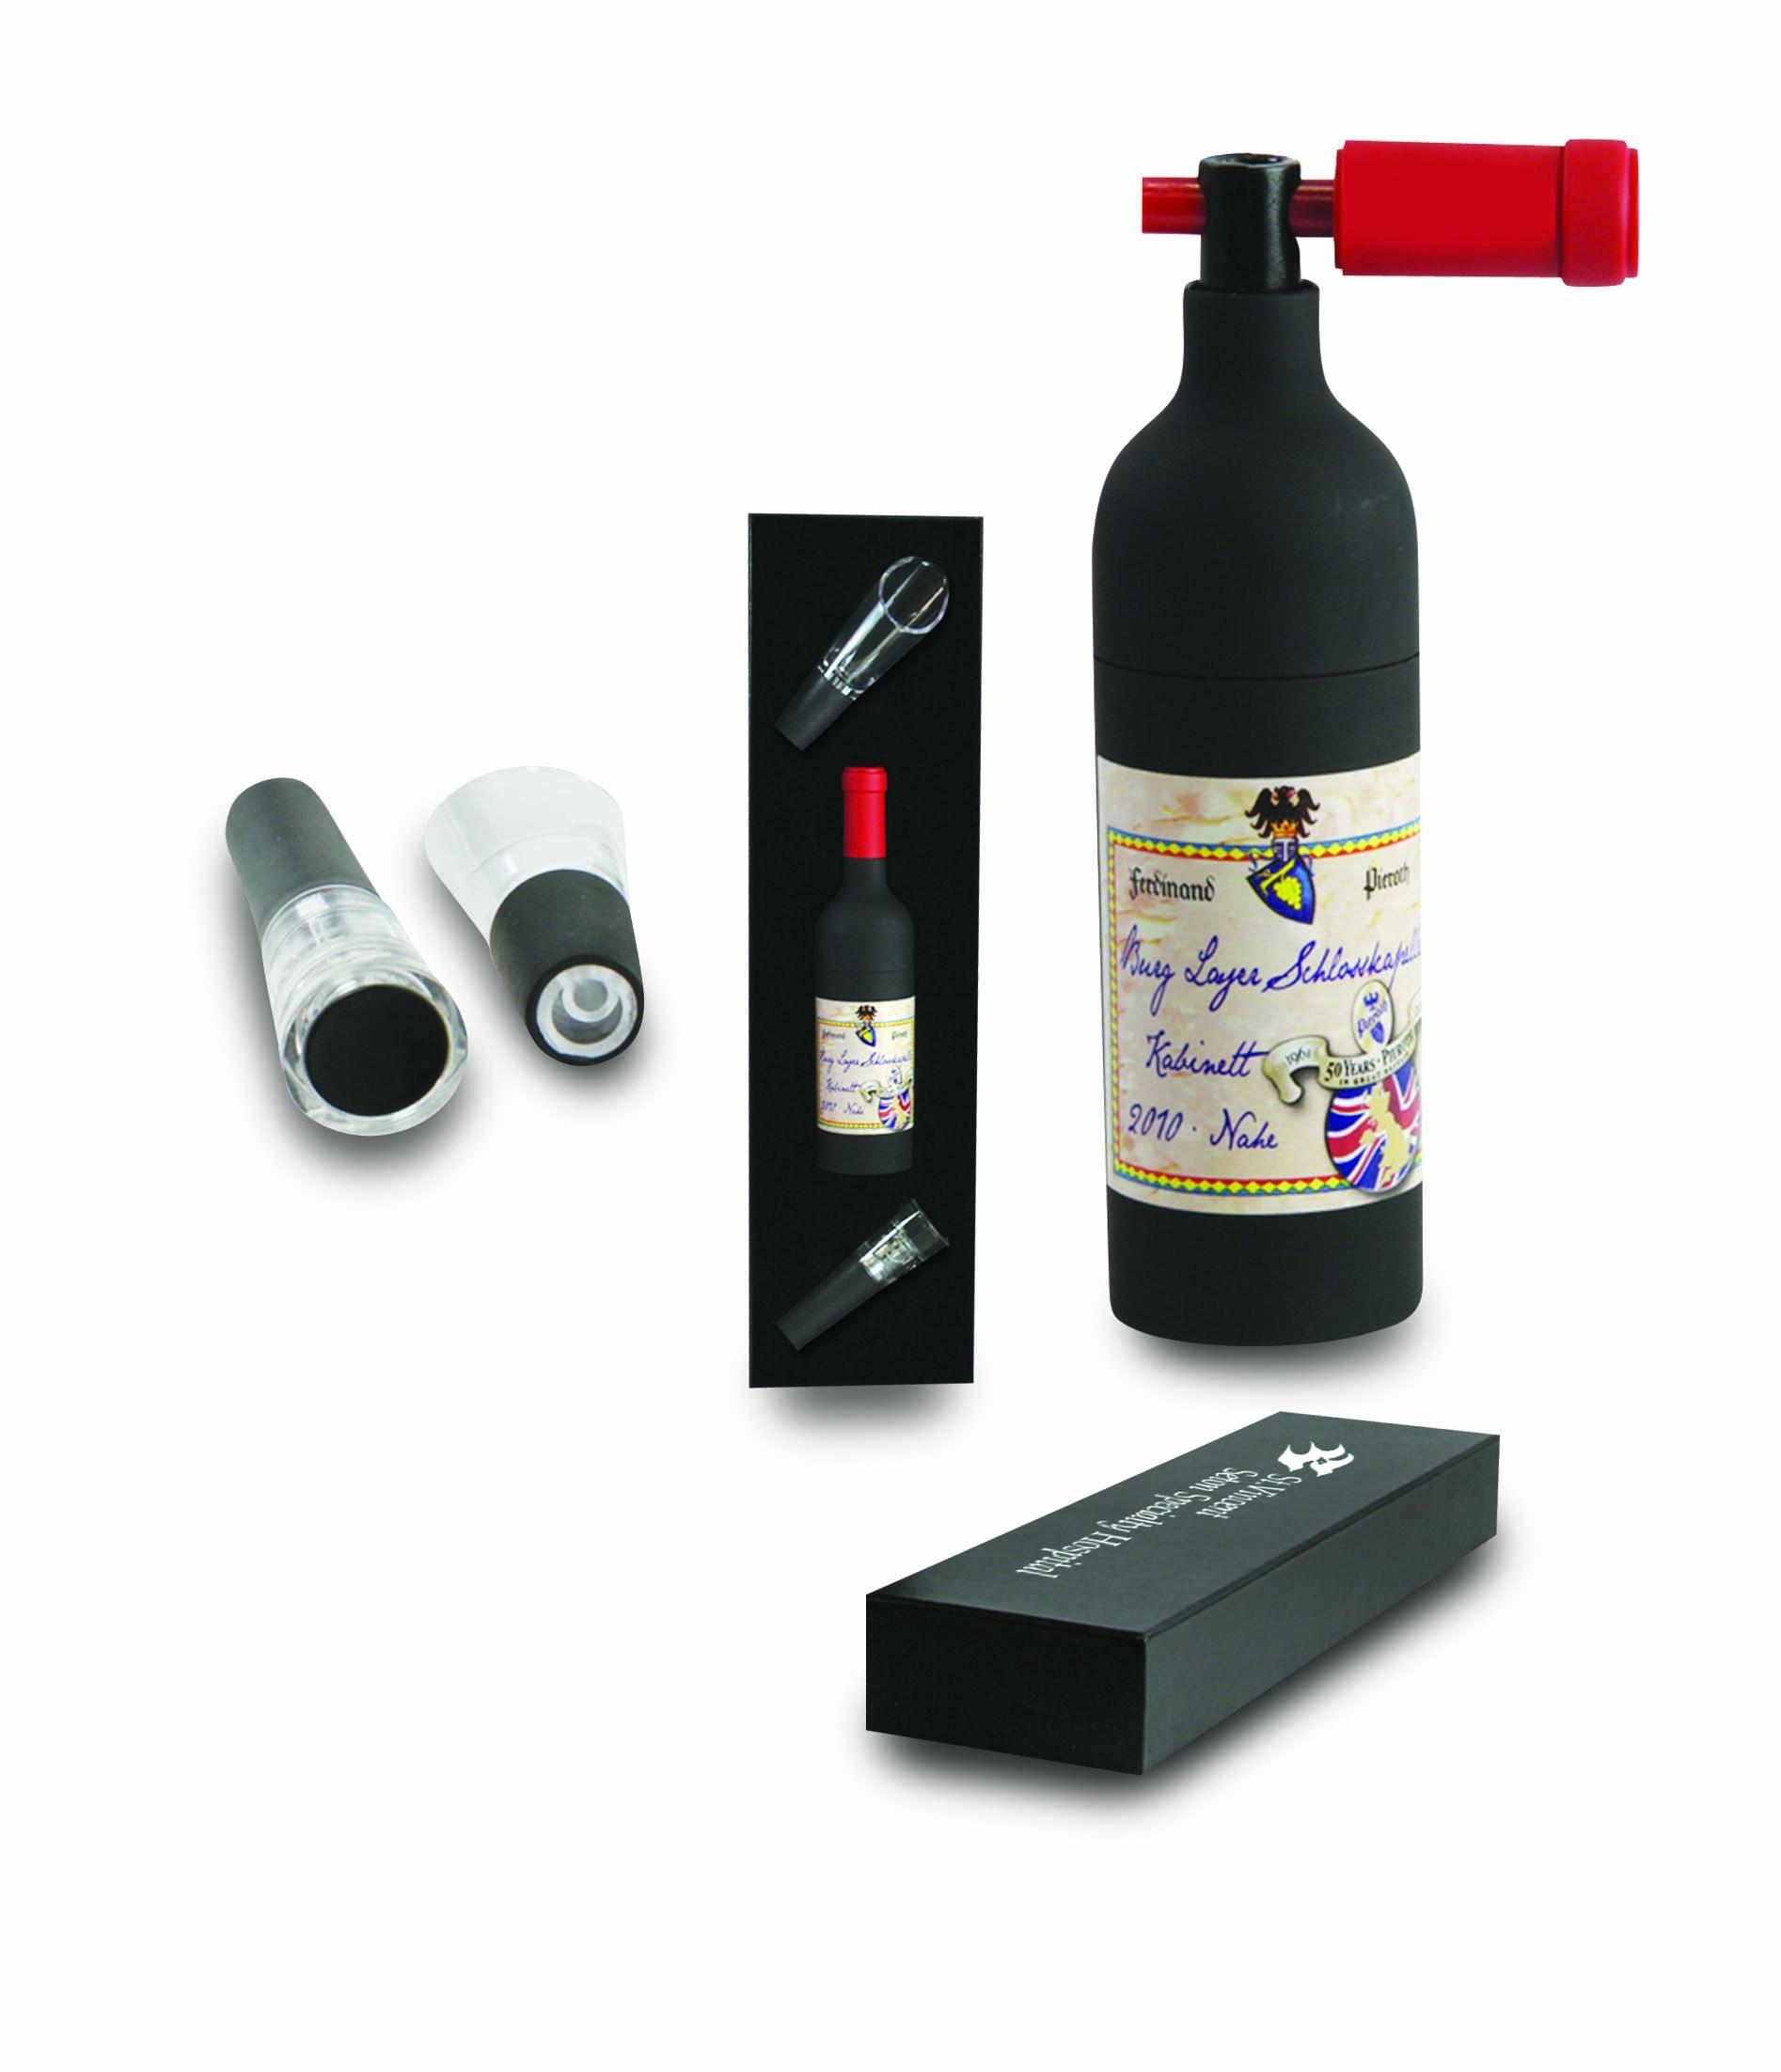 Wine Gift Set in Black Gift Box (608345)